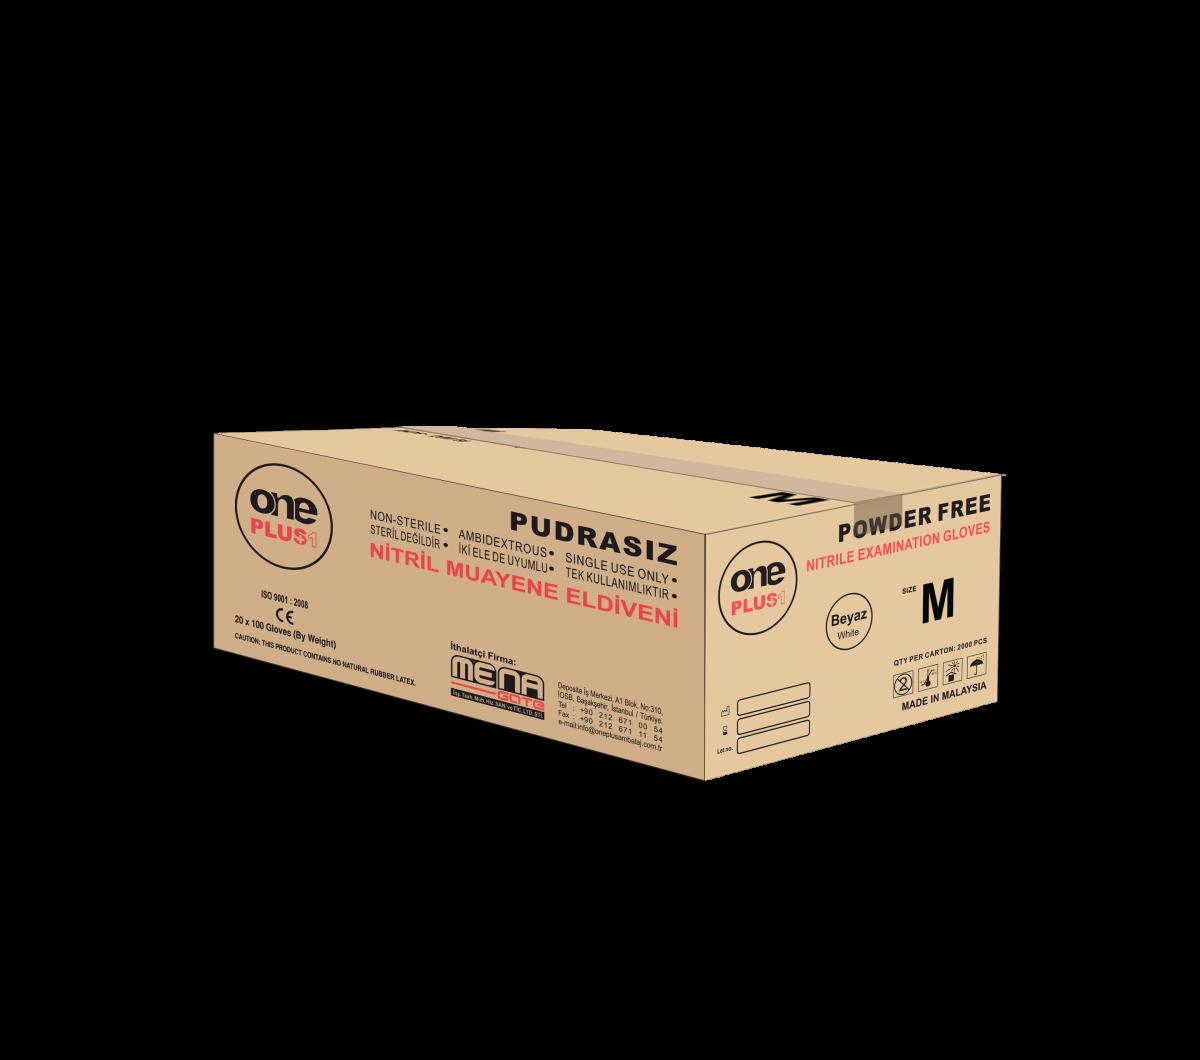 OnePlus Ambalaj Nitril Pudrasiz Muayene Eldiveni Siyah koli (20 paket × 100'lü paket) M